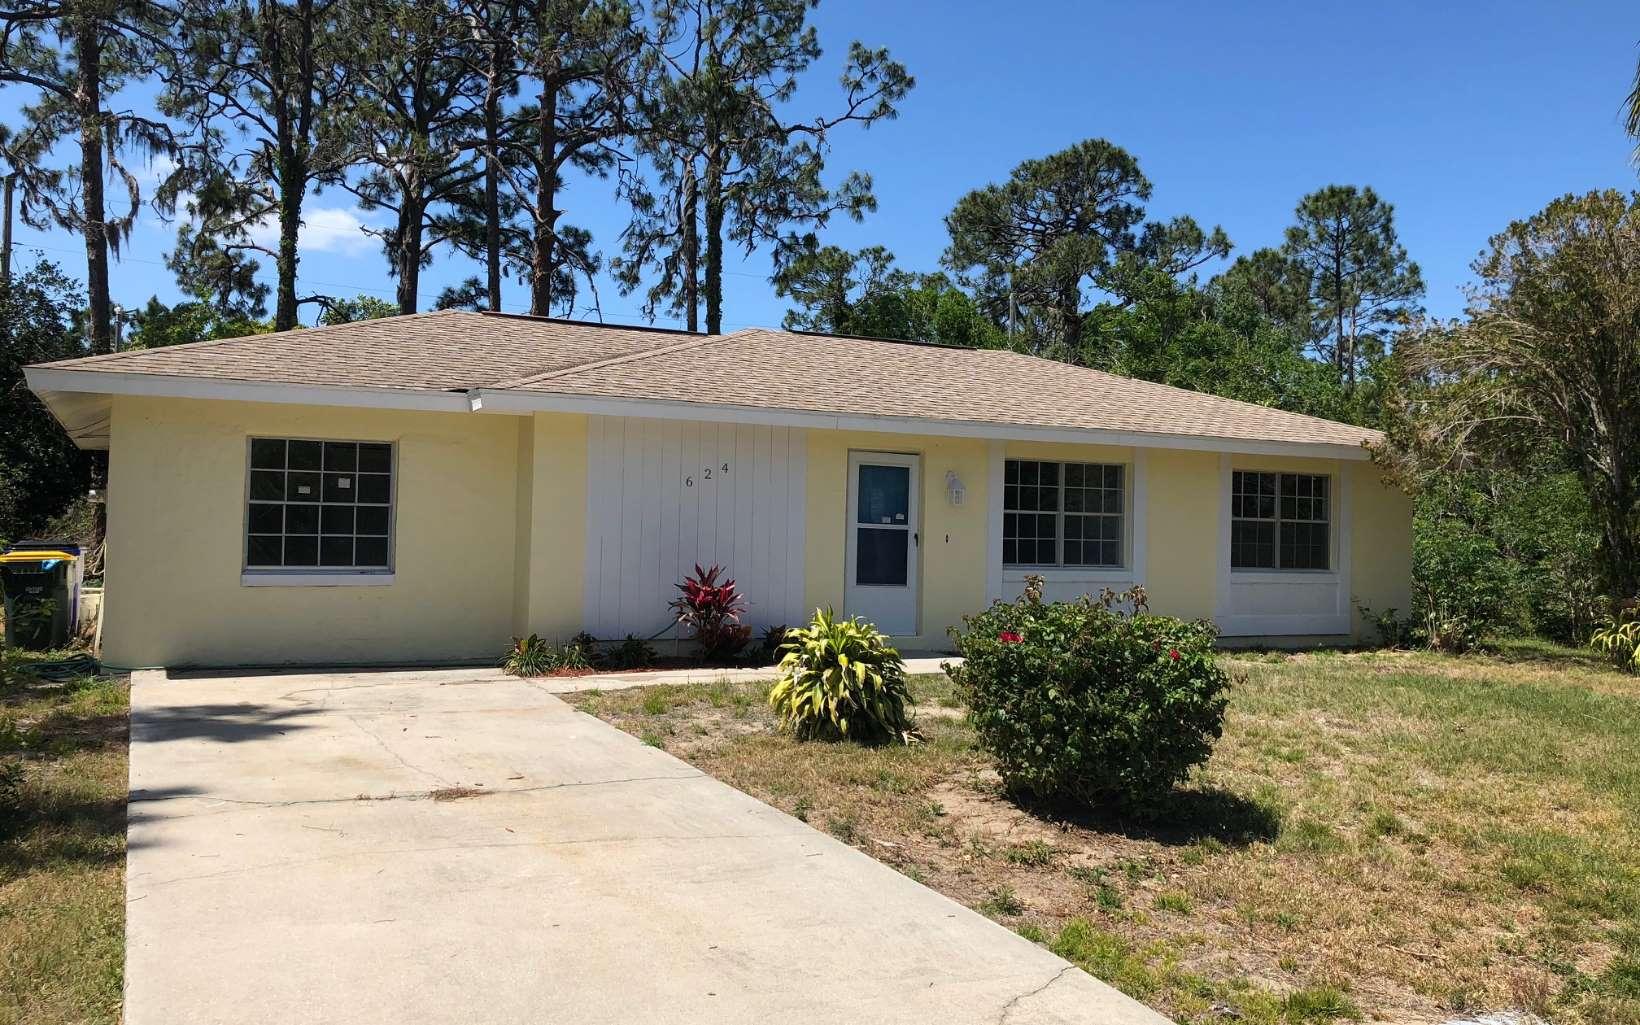 624 Fairfield Ave, Lake Placid, FL 33852